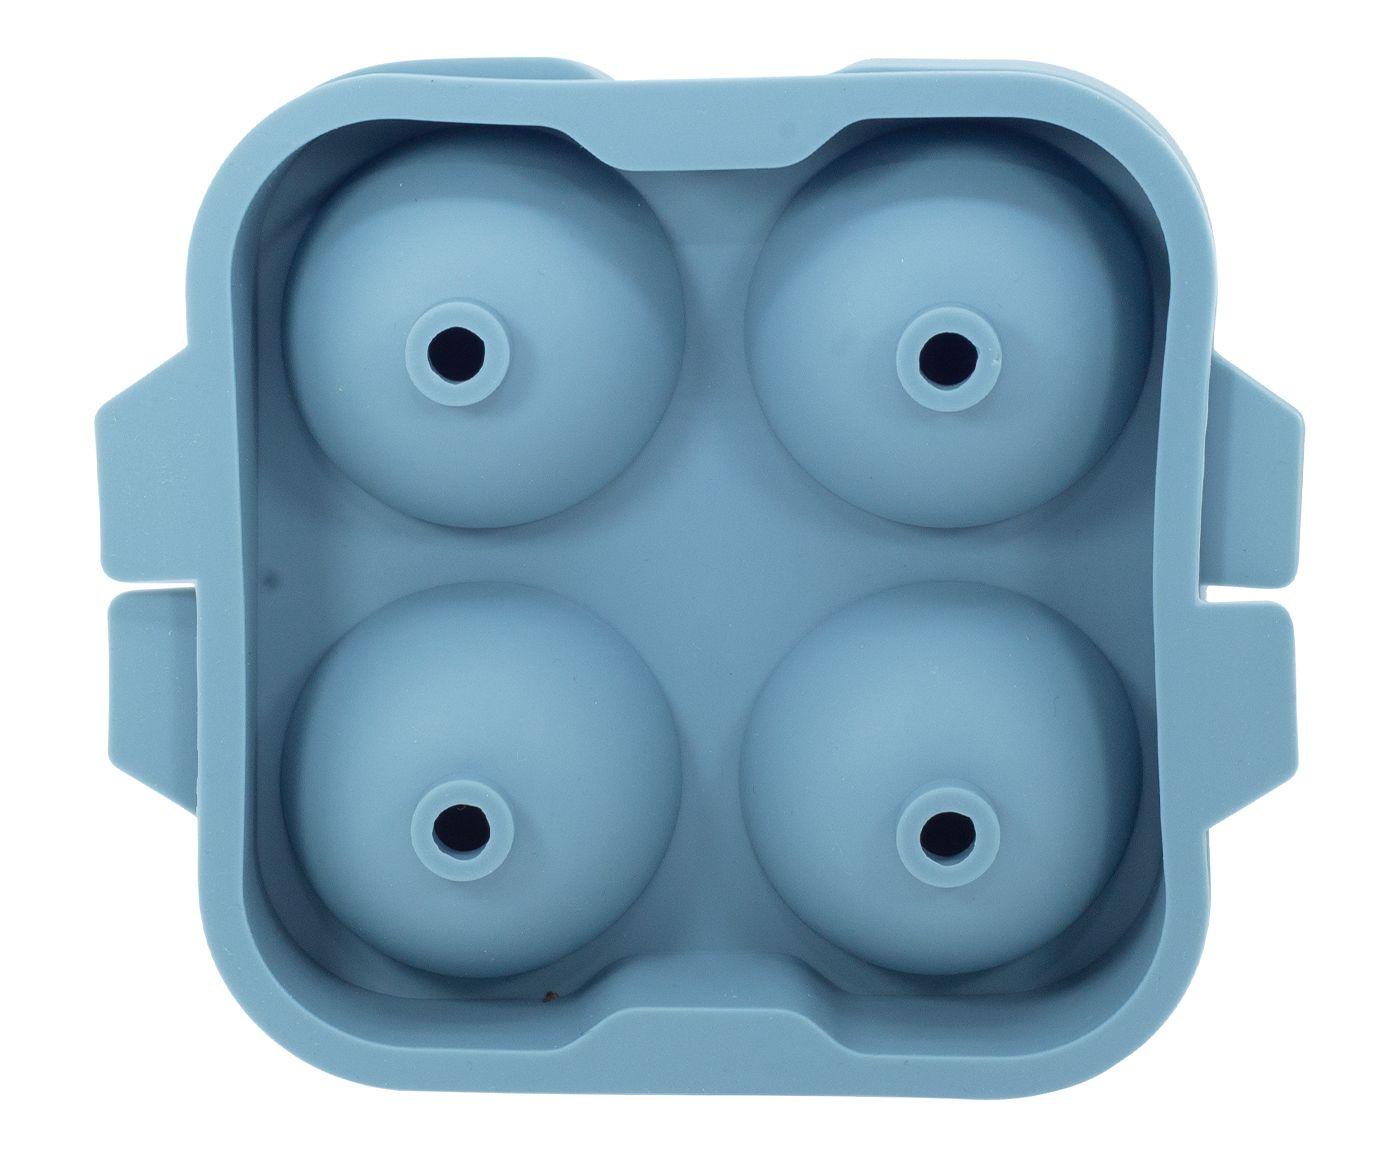 Forma para Gelo Esférico Prudent Azul - 14X11,8cm | Westwing.com.br